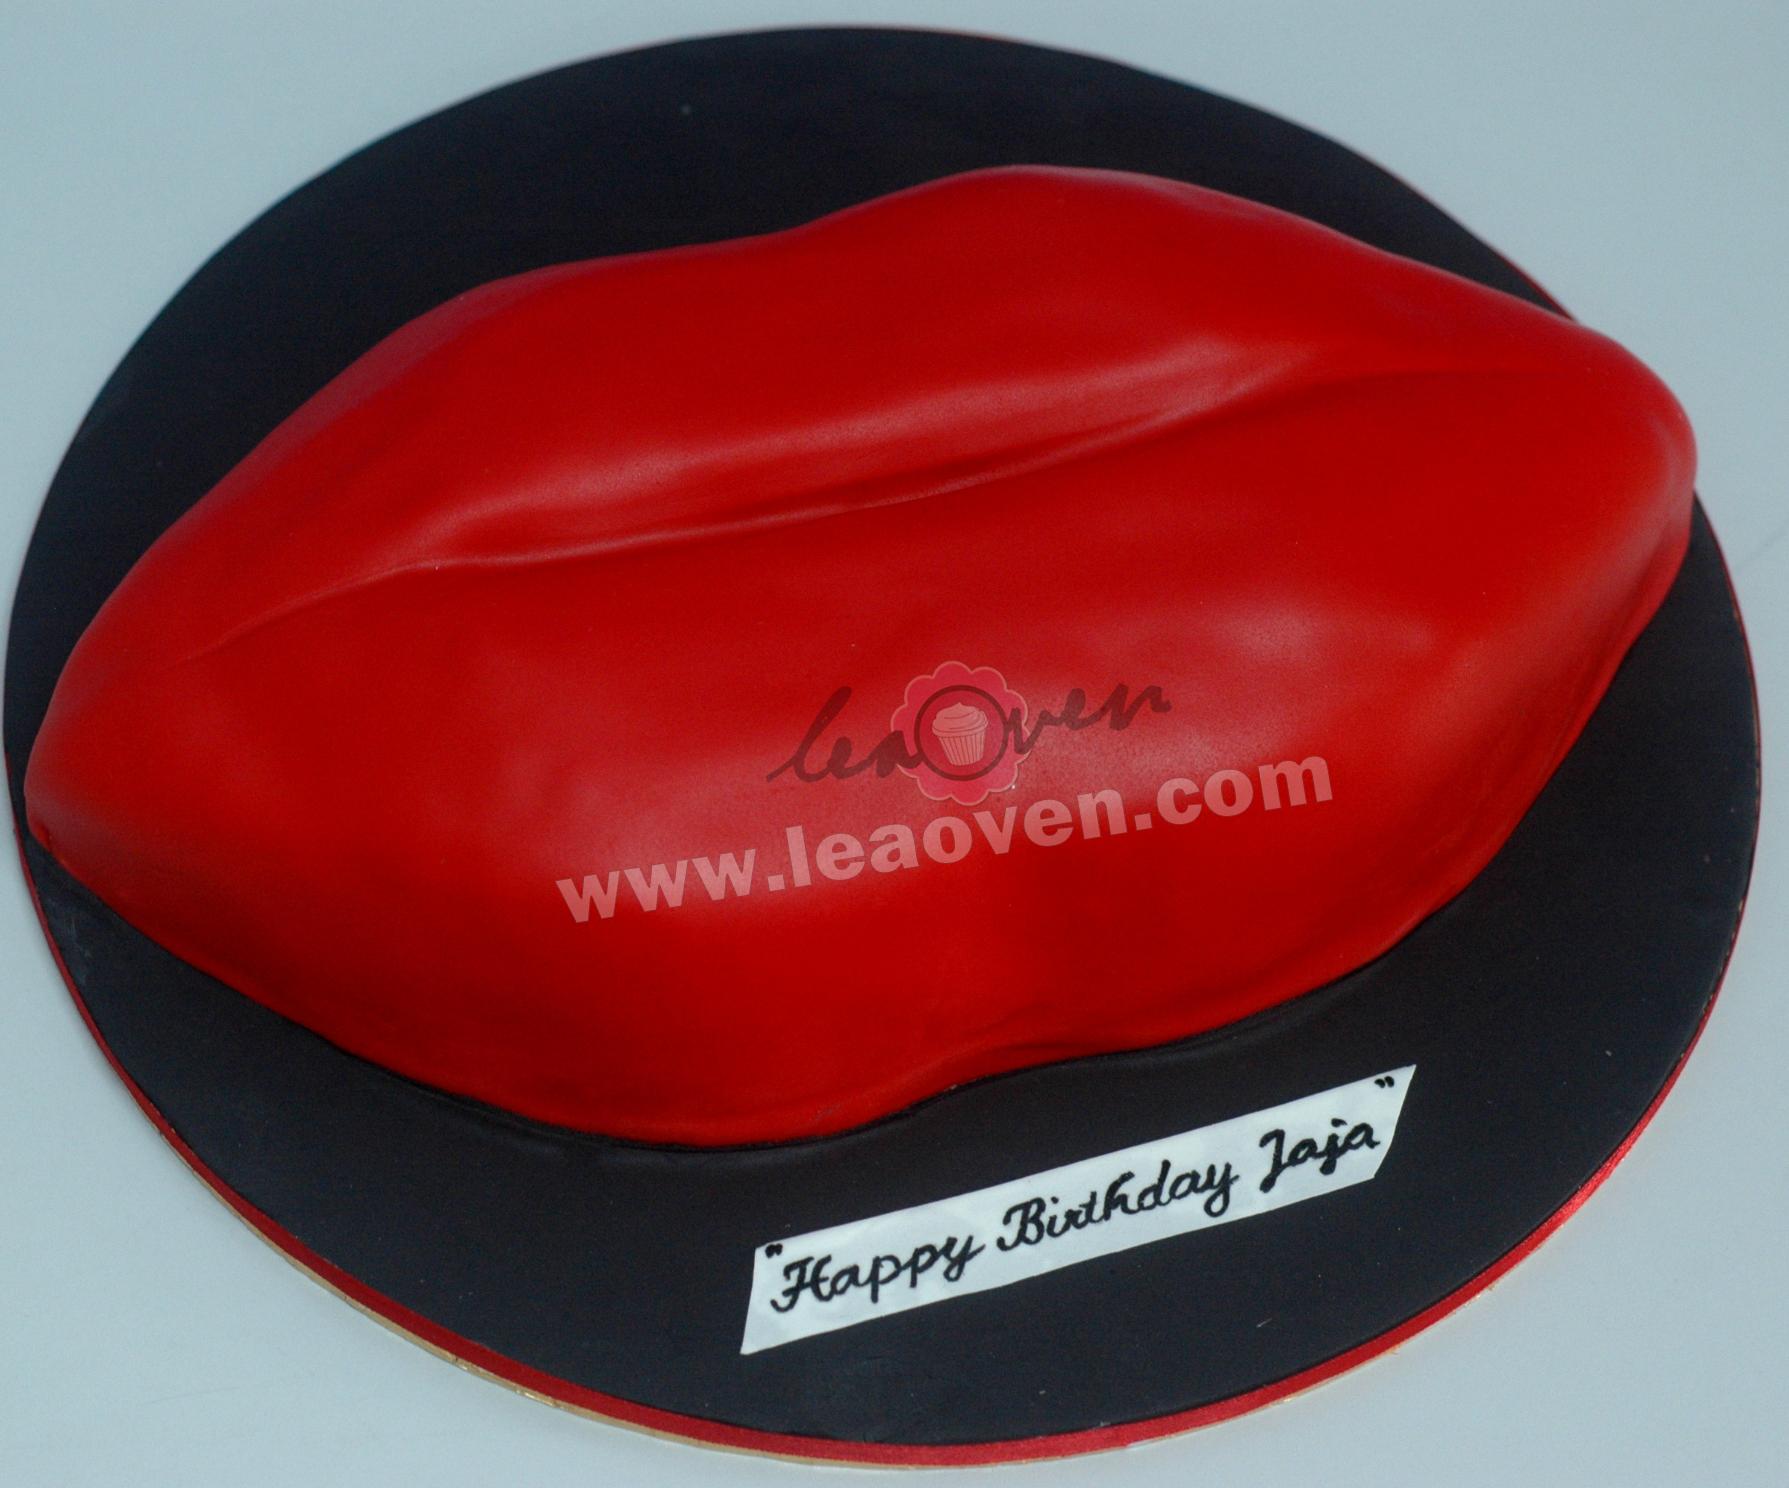 Lea Oven Red Lips Birthday Cake